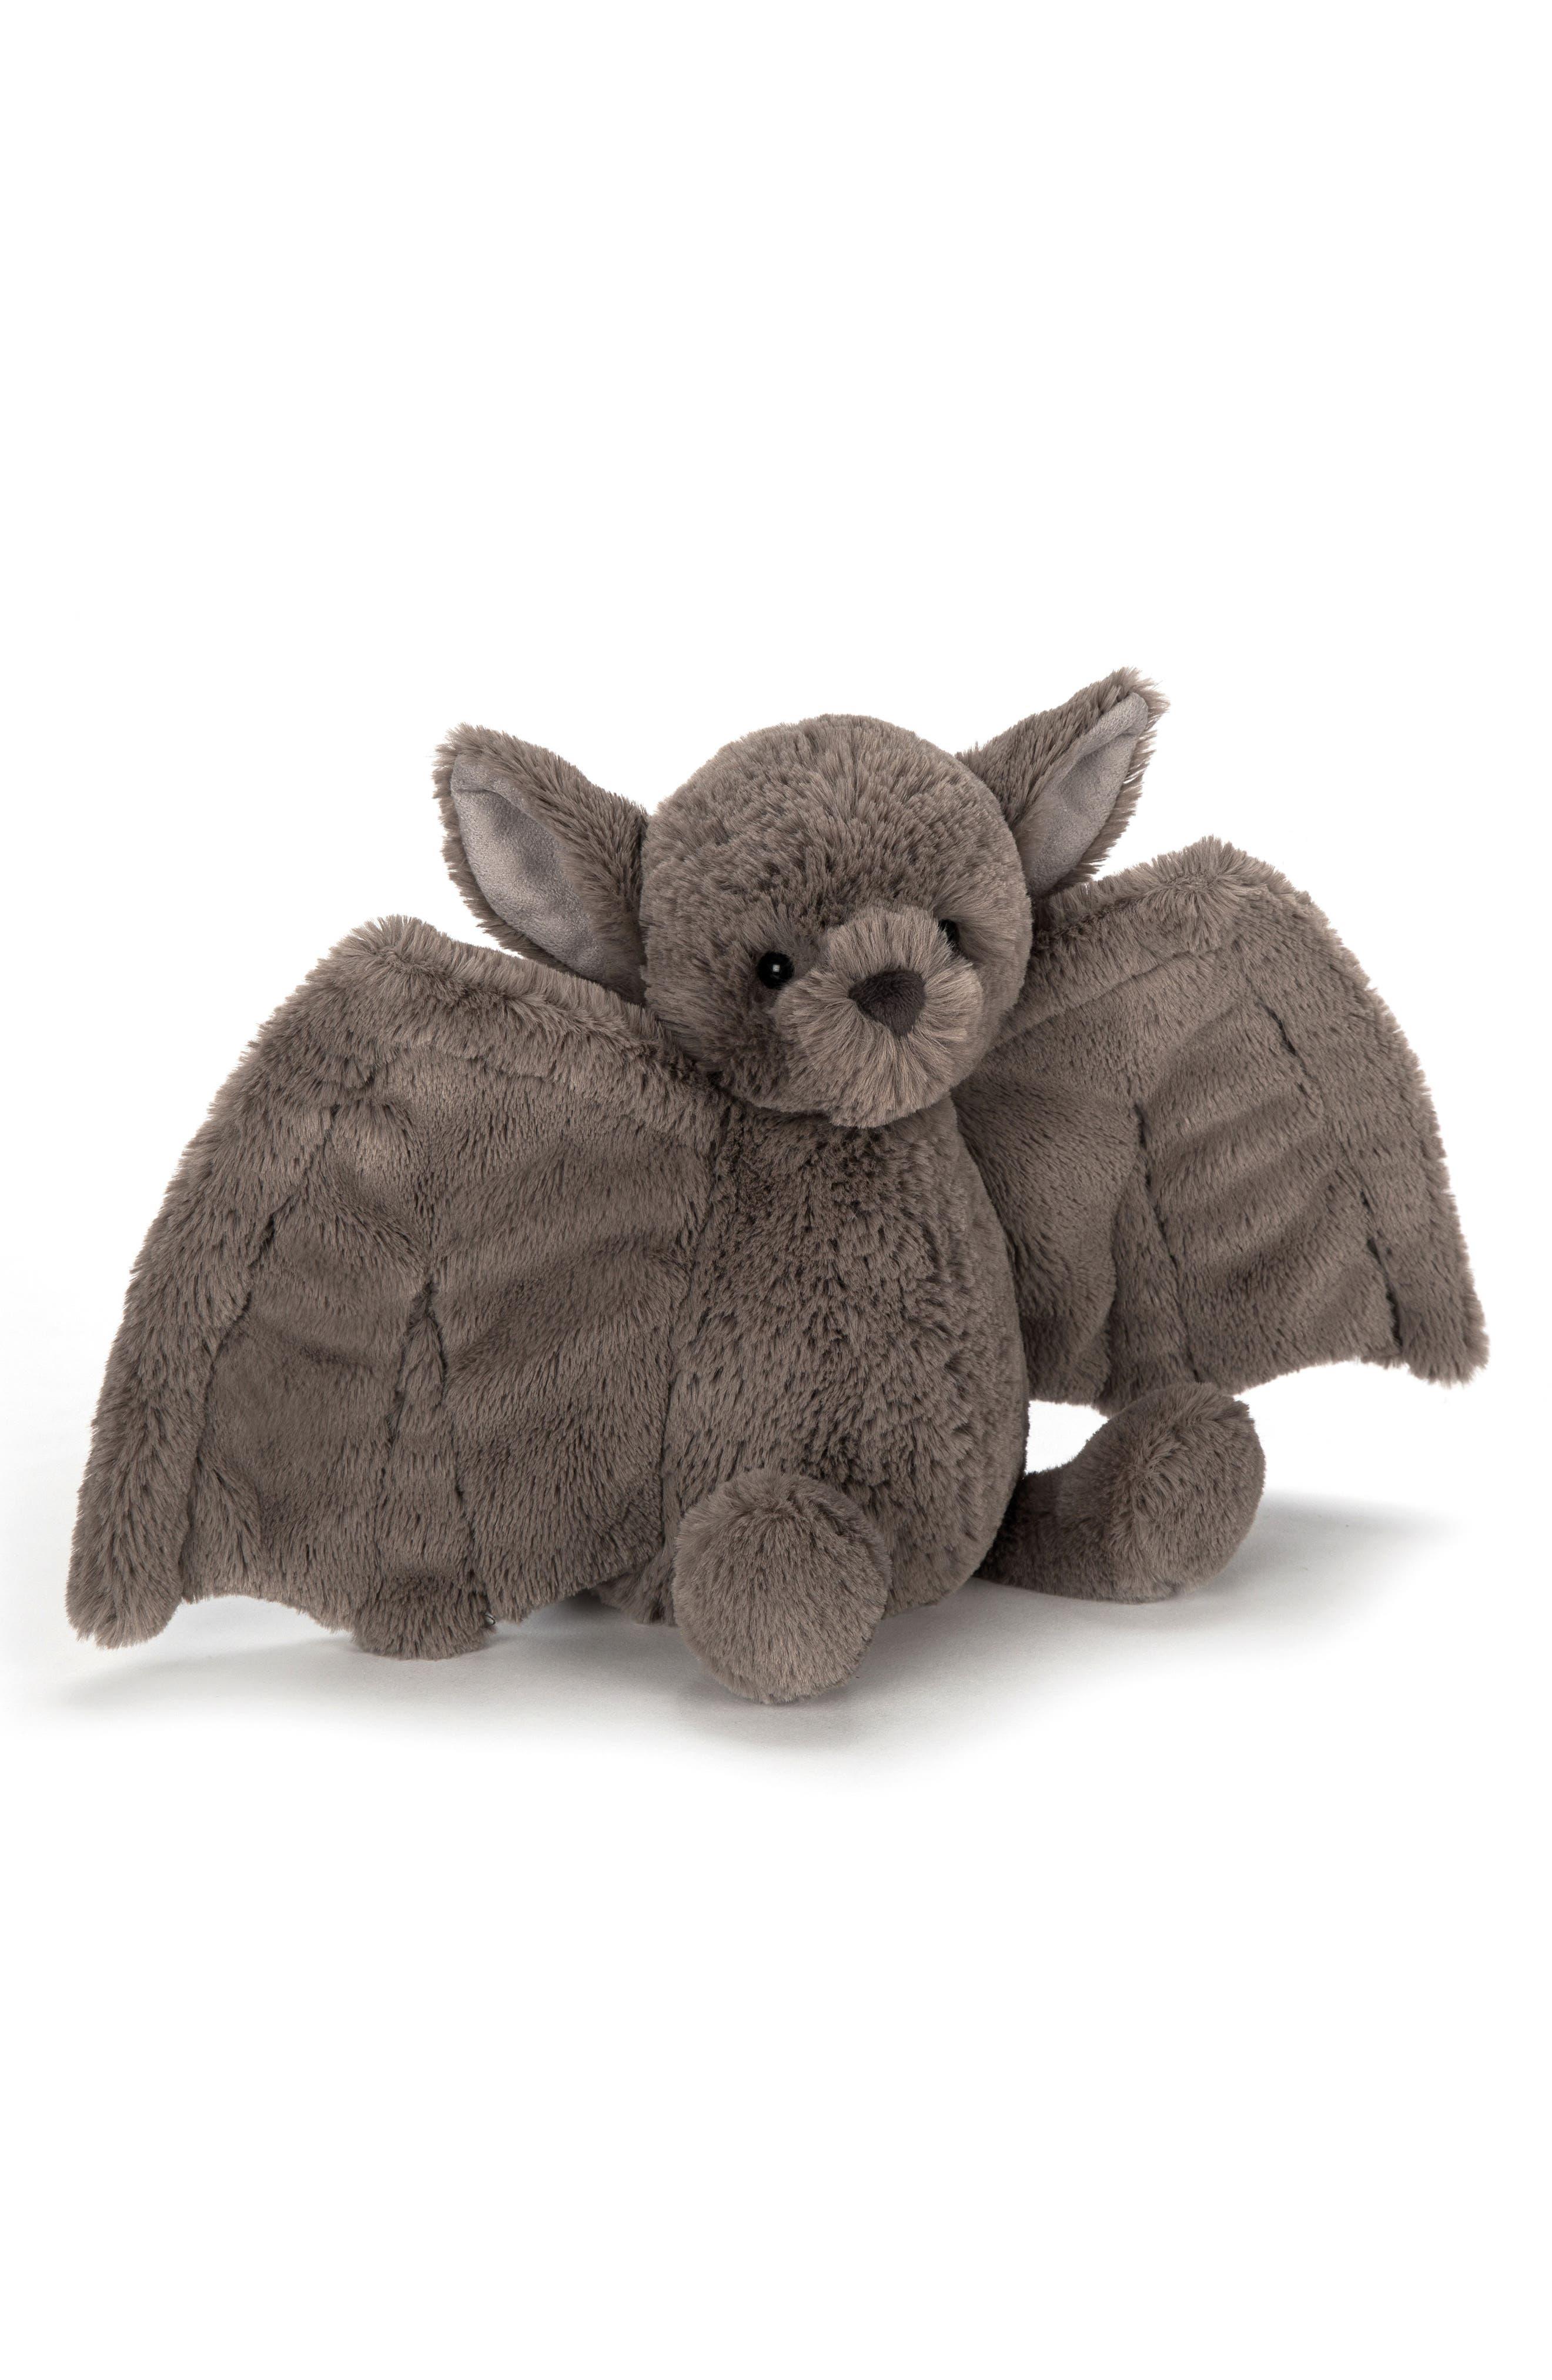 Jellycat Medium Bashful Bat Stuffed Animal